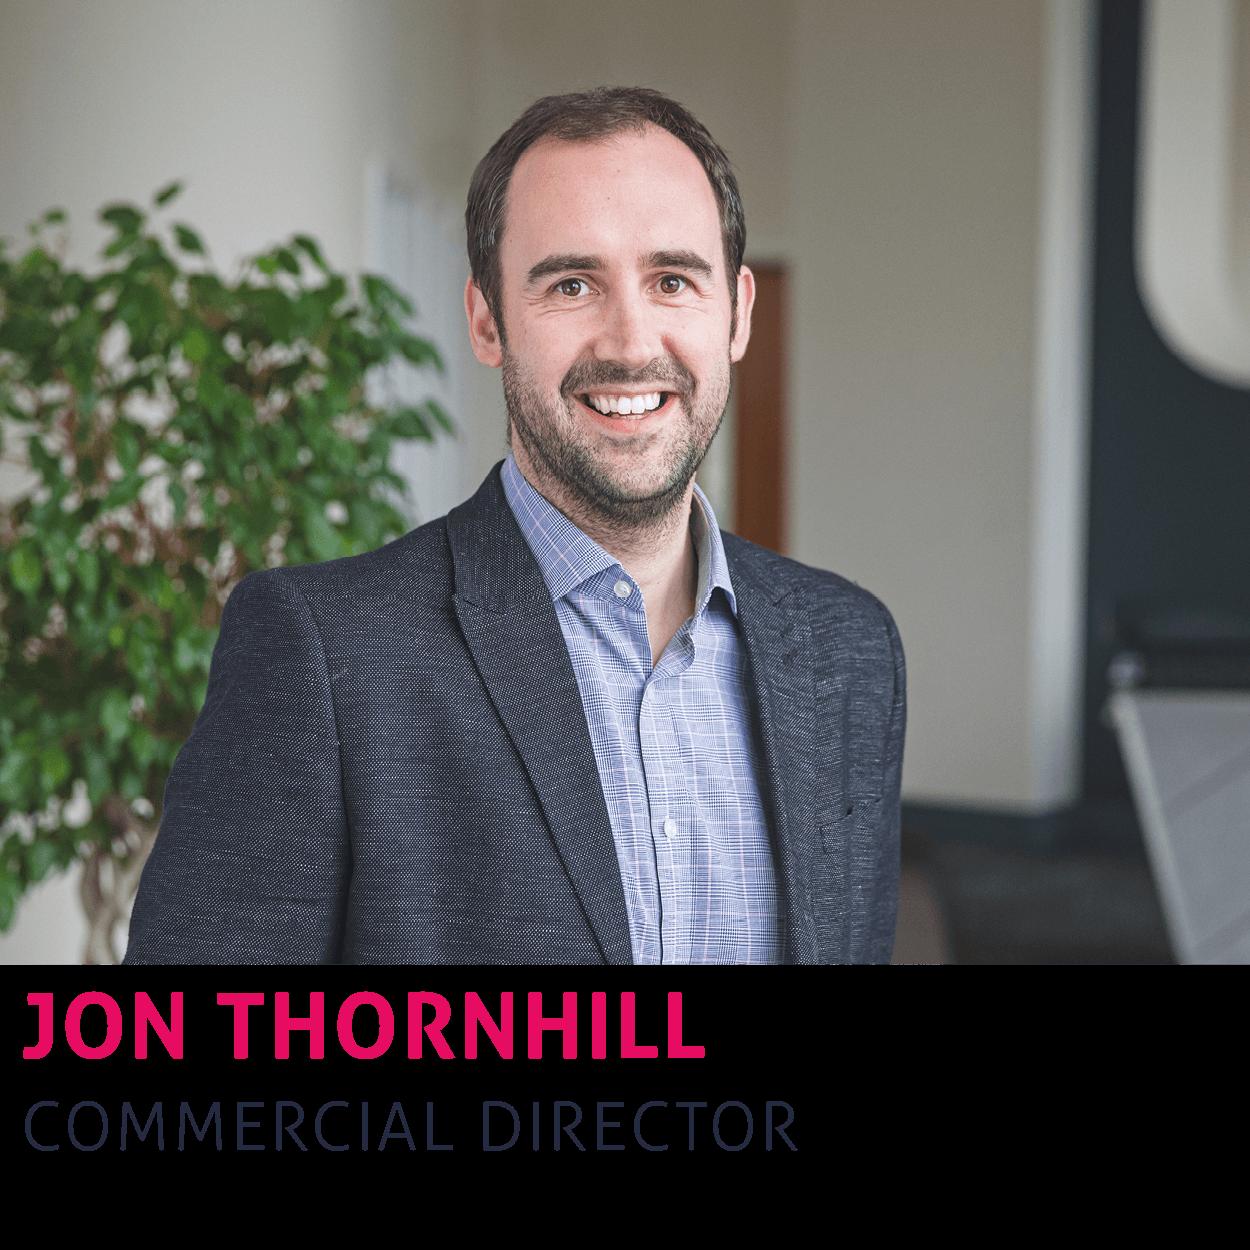 Jon Thornhill, Commercial Director